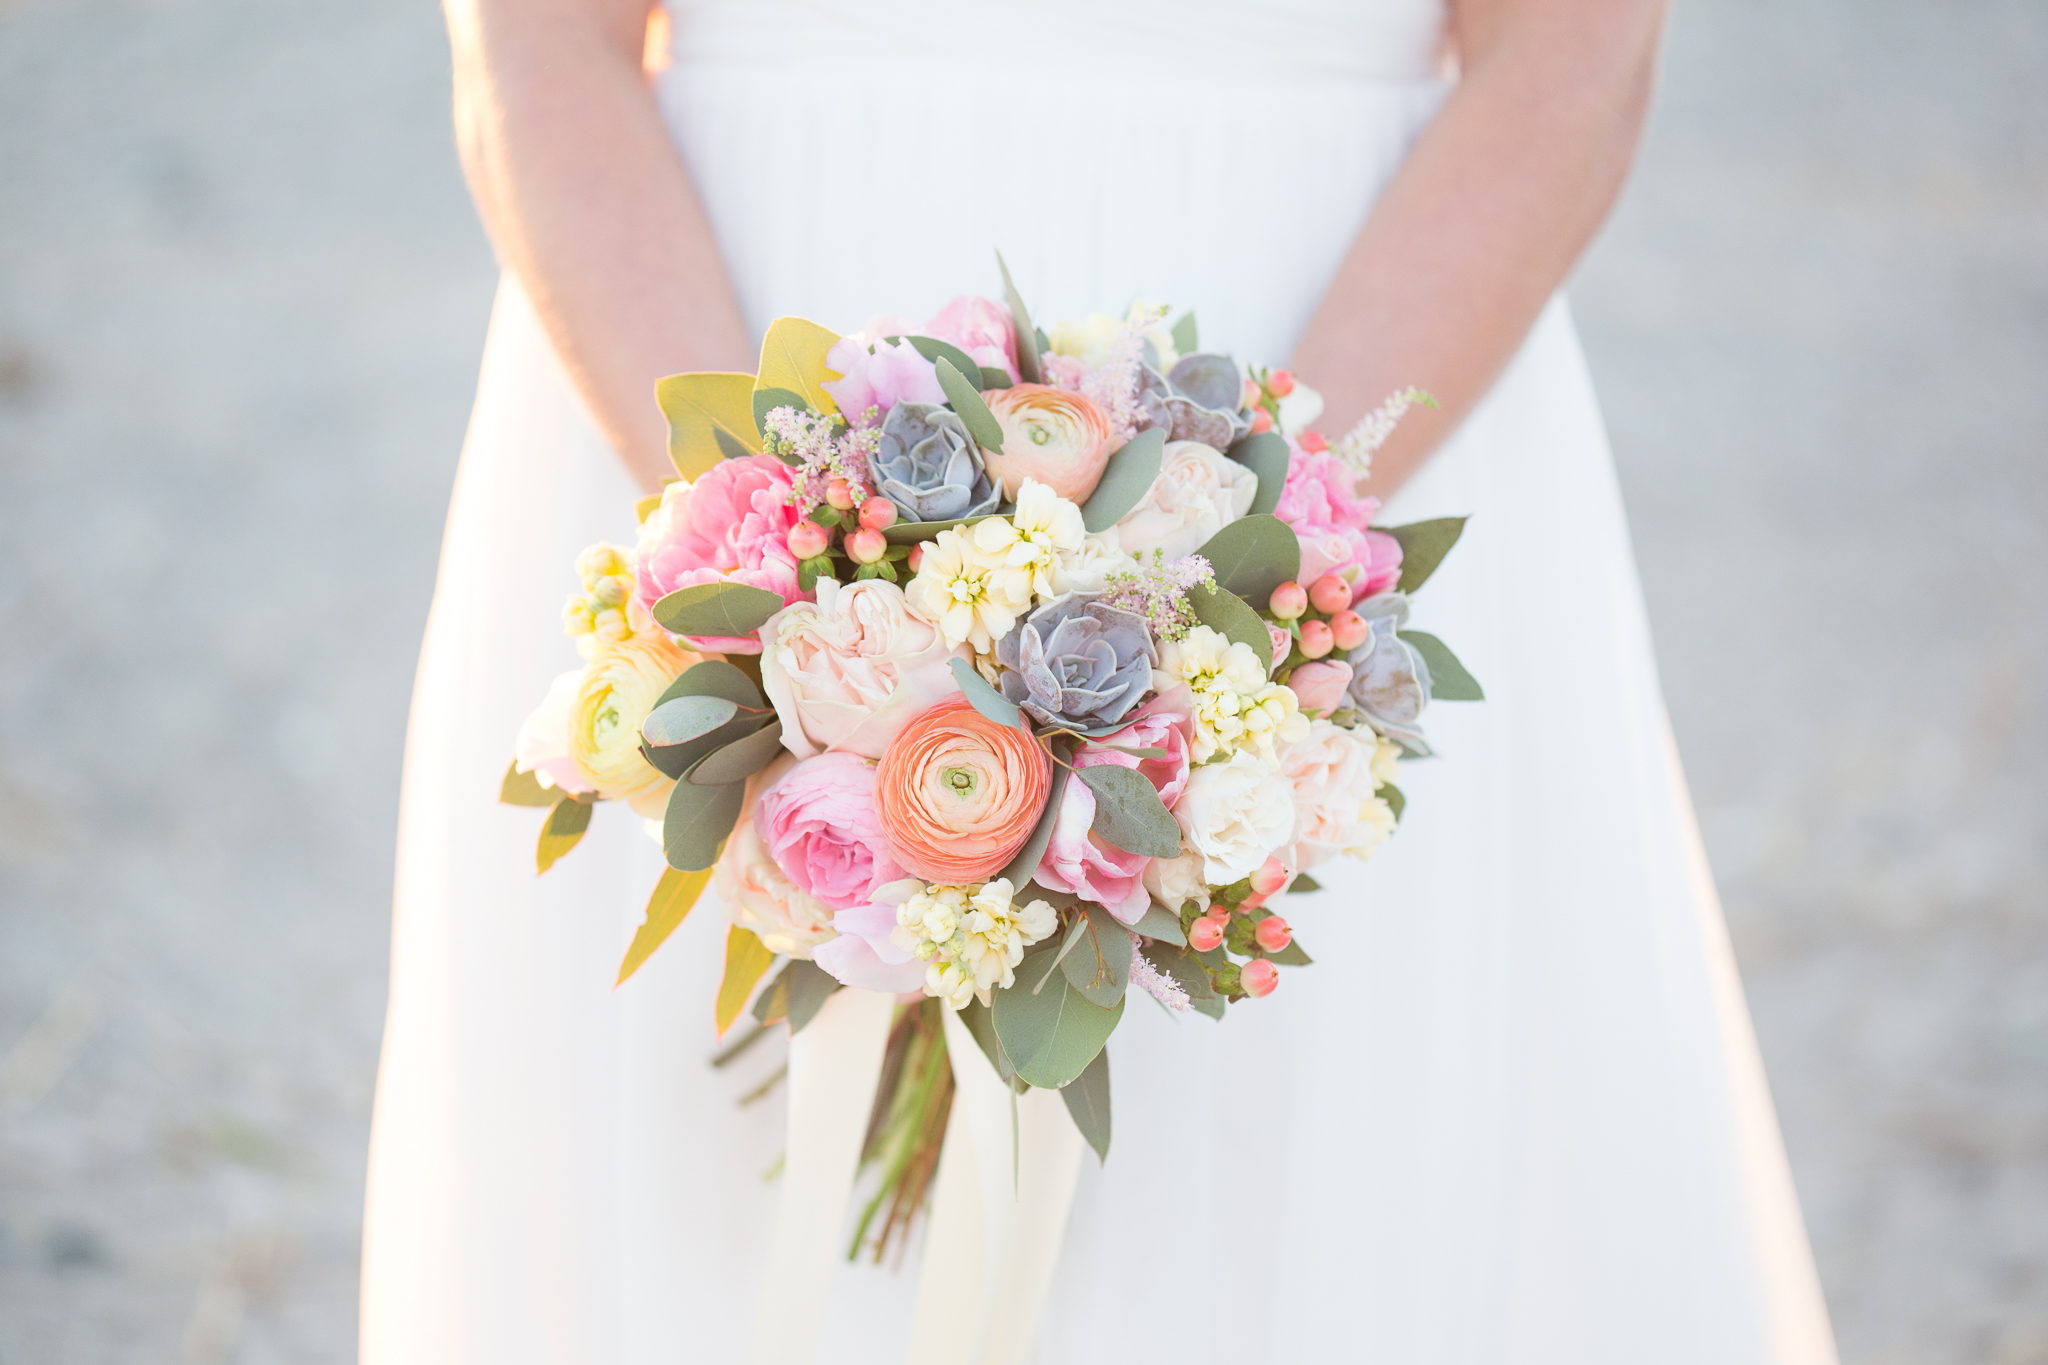 Floral Designs by Justine   Vendor Love   Shaina Lee Photography   Connecticut + Destination Wedding Photographer   Connecticut Florist   Justine Leeper